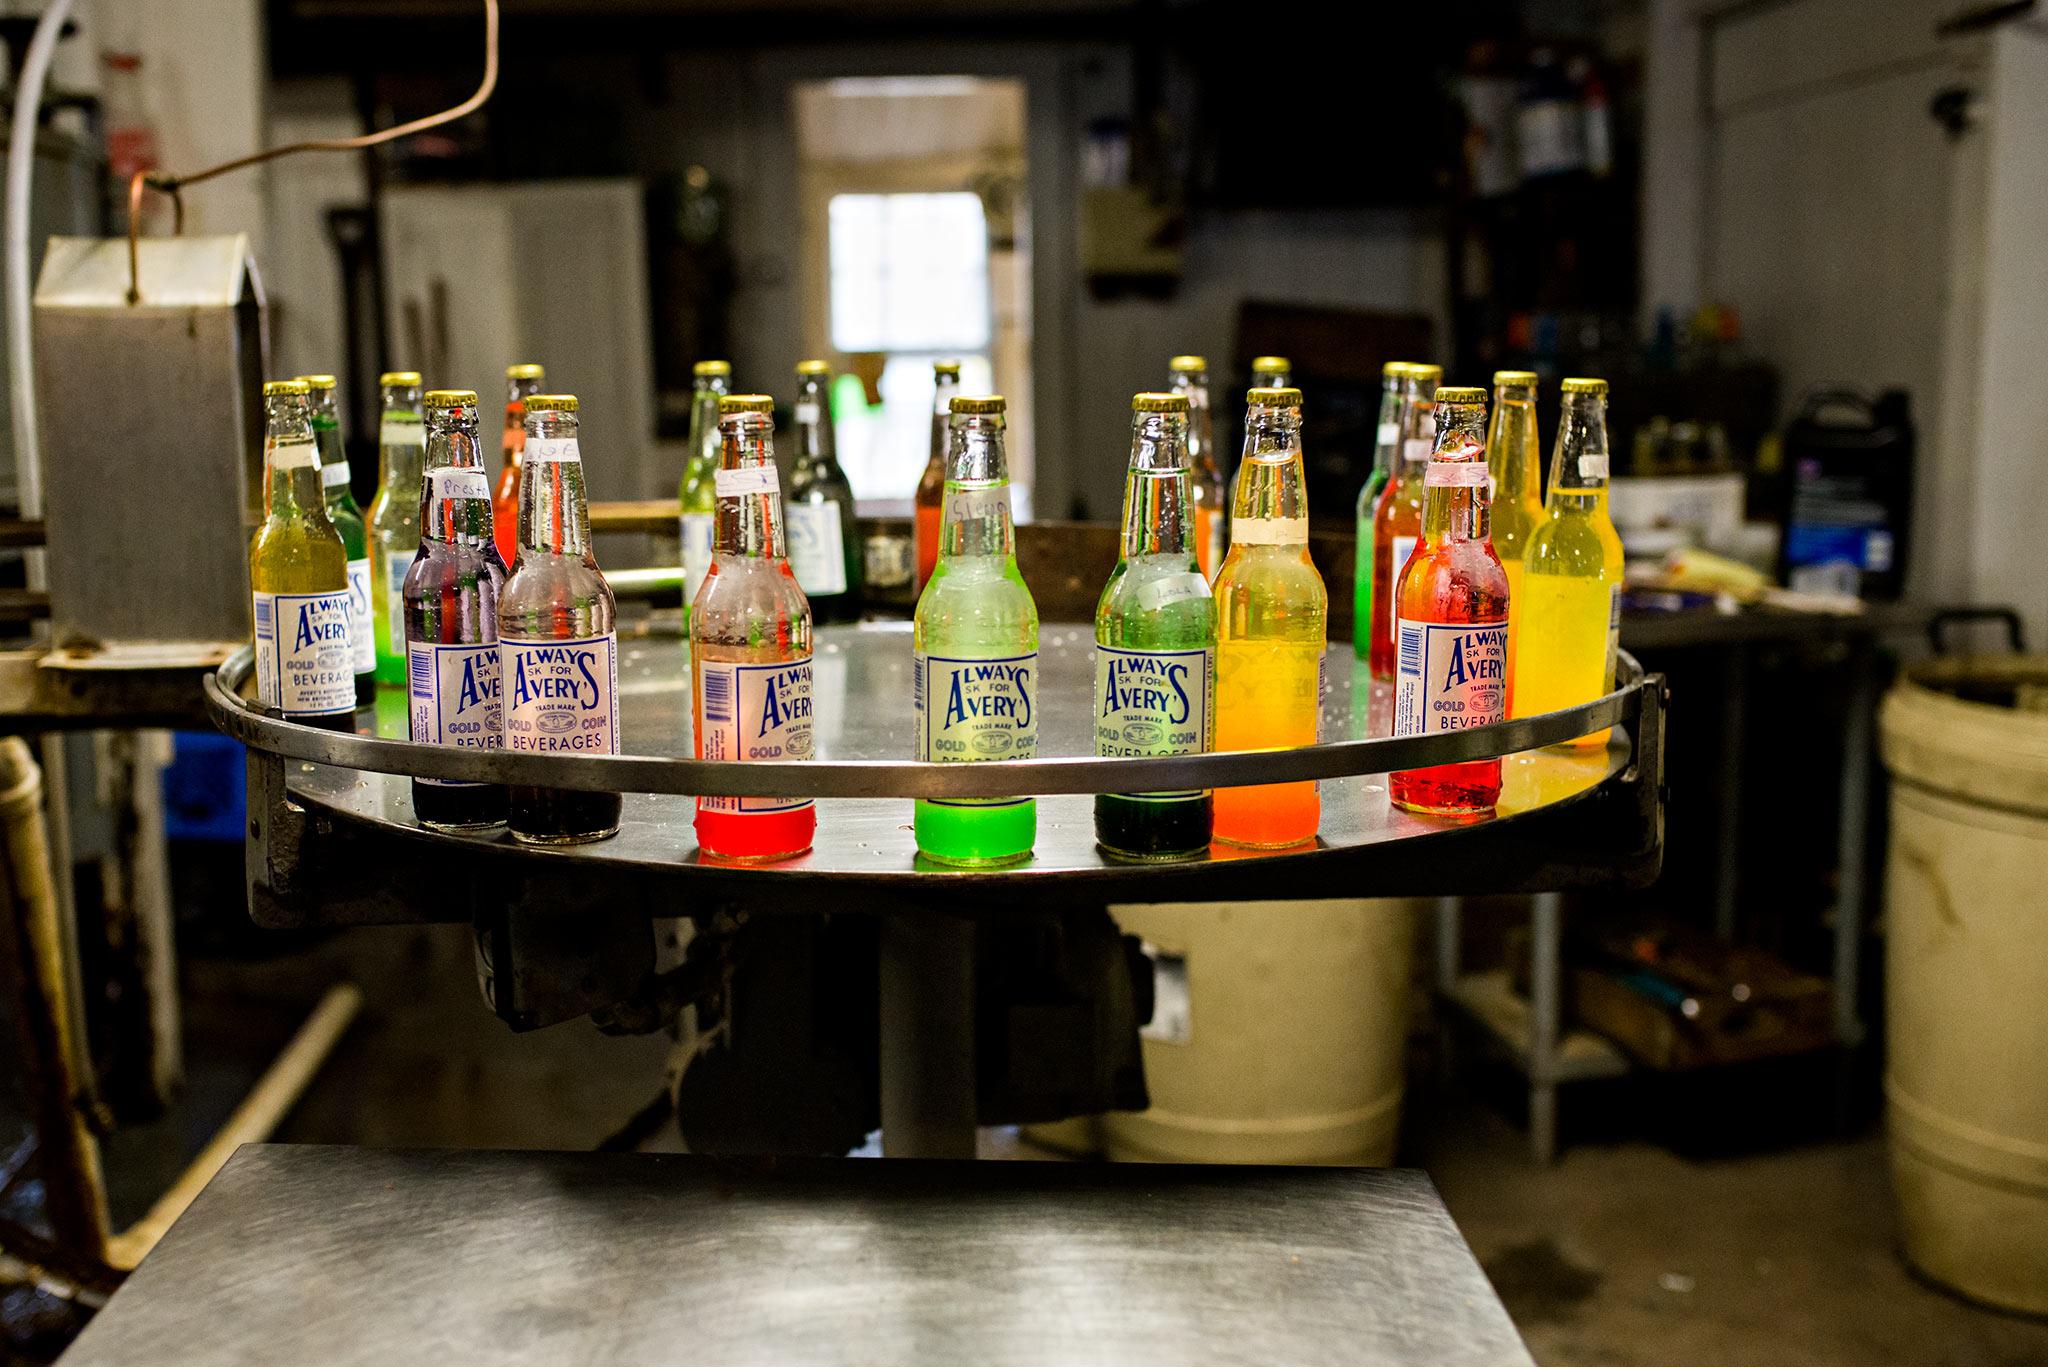 soda bottles ready to be hand mixed averys soda new britain connecticut photography